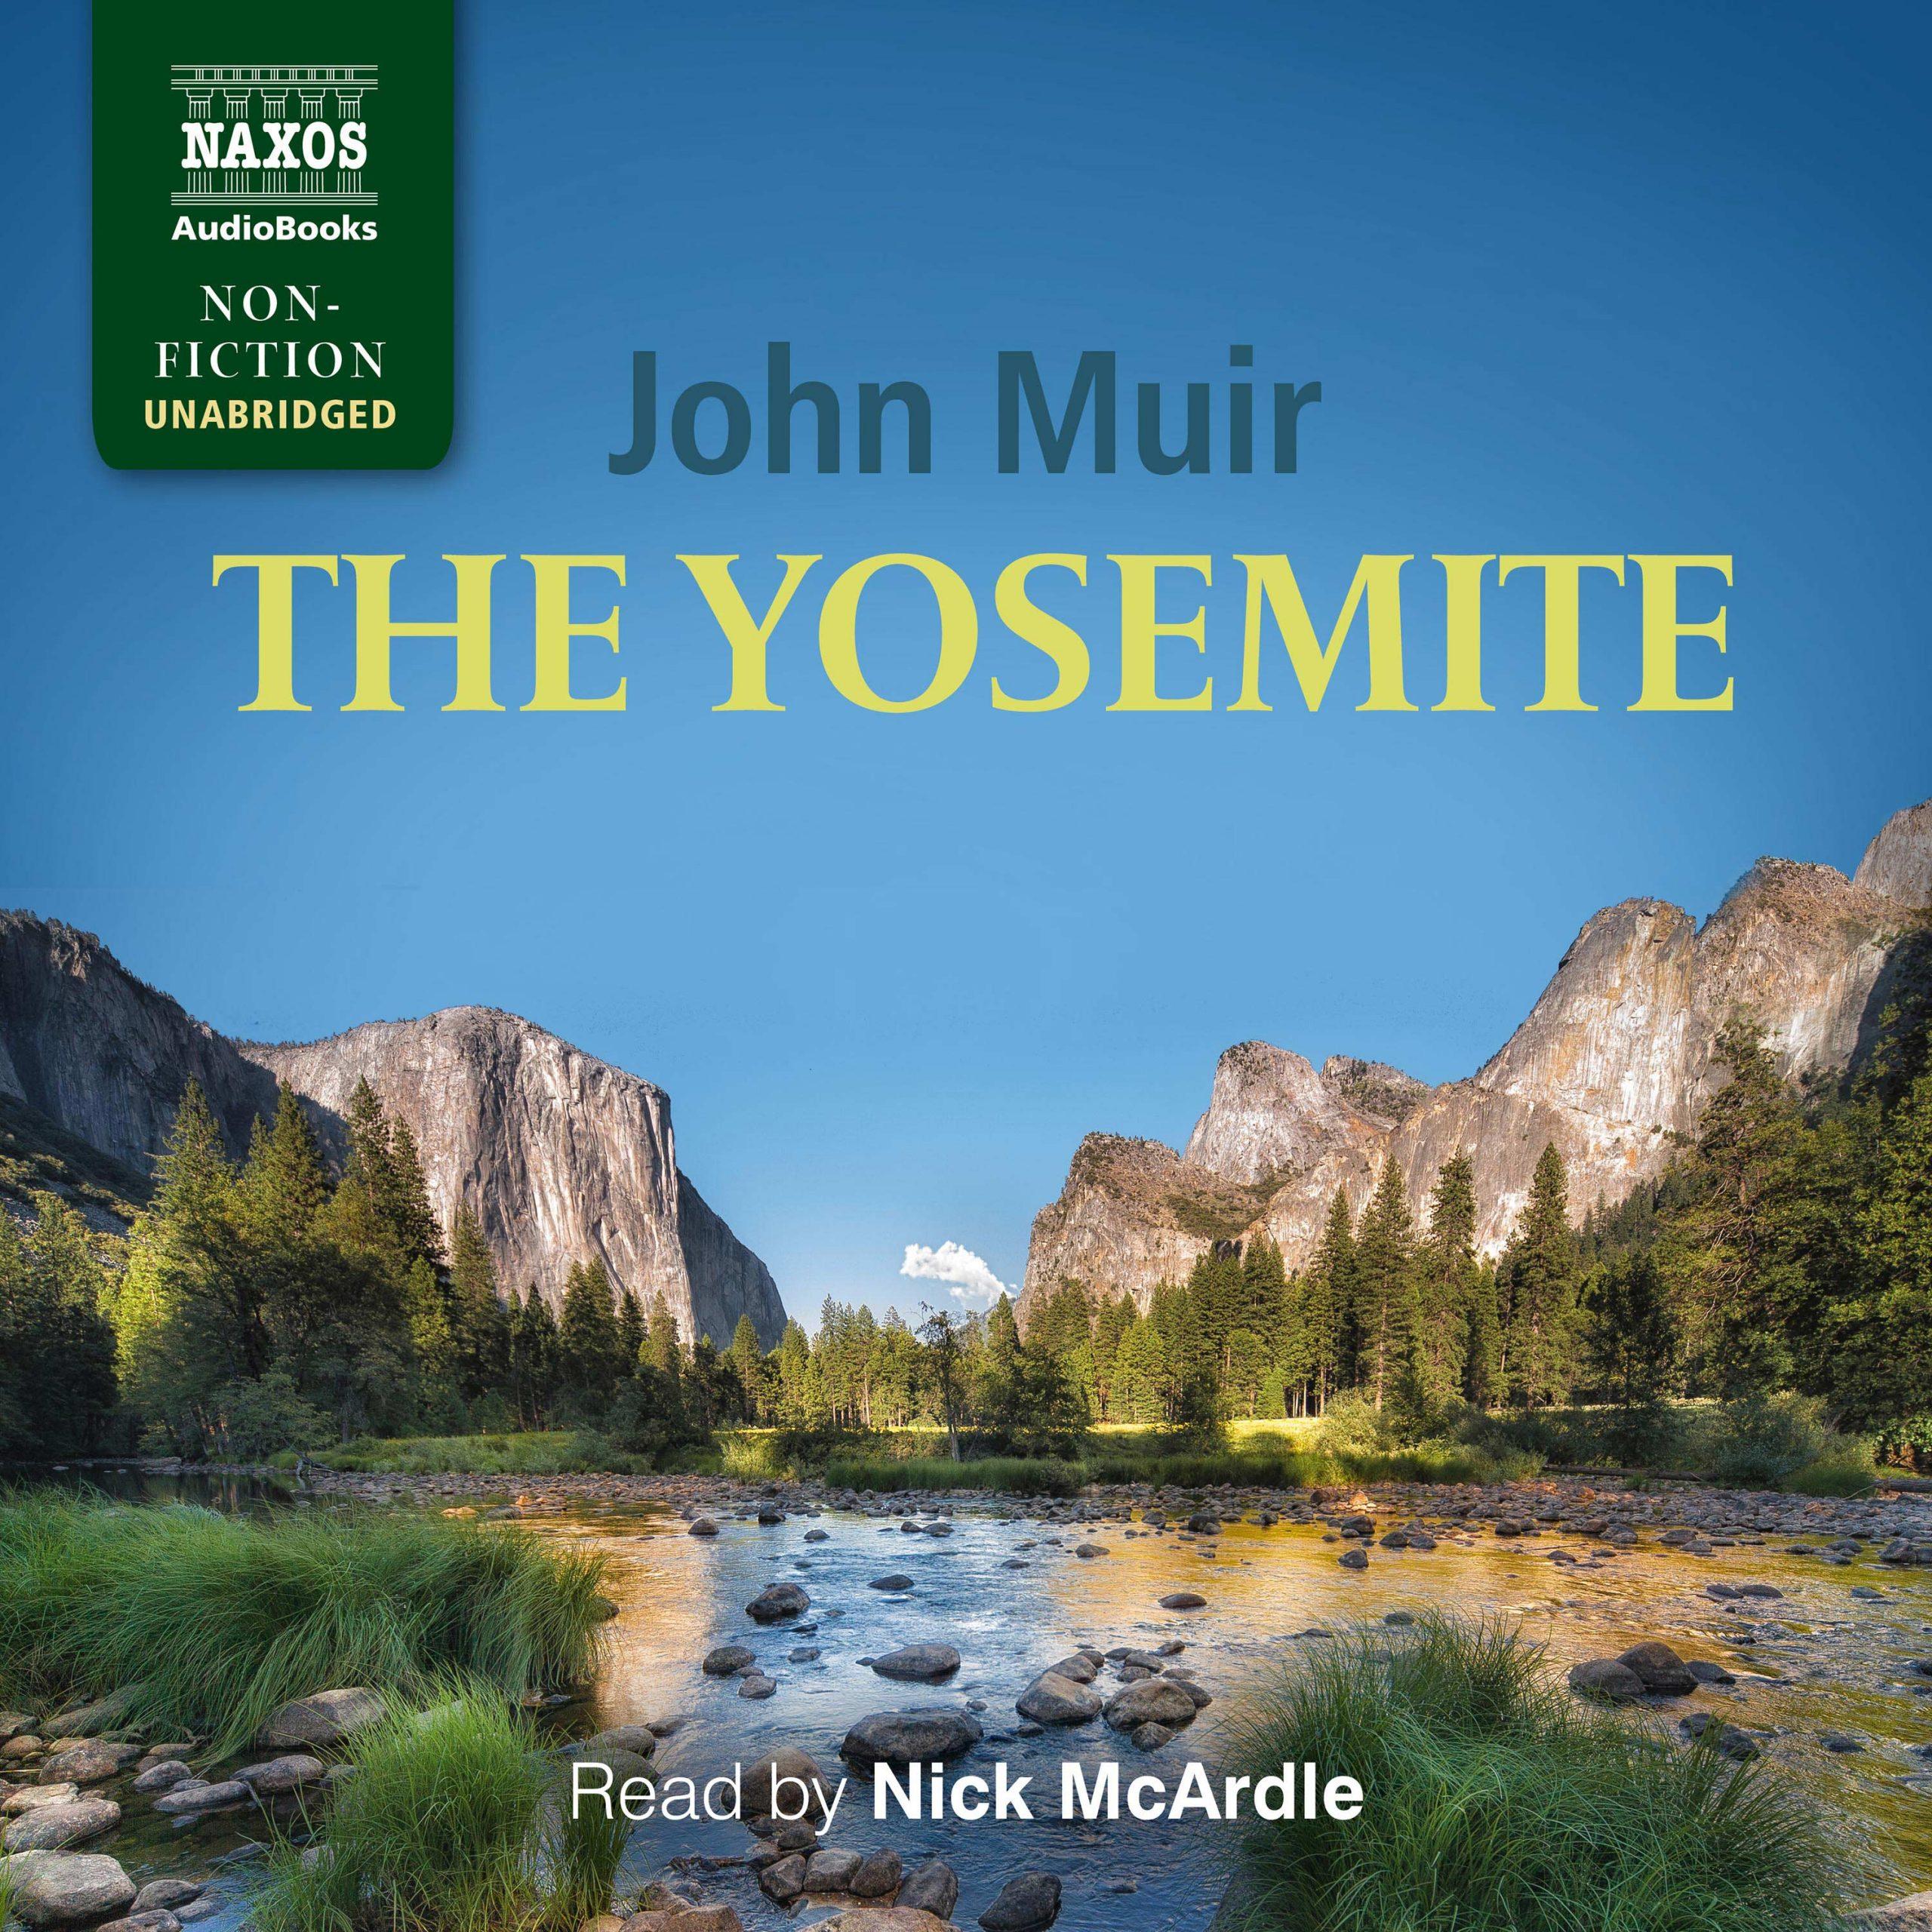 The Yosemite (unabridged)